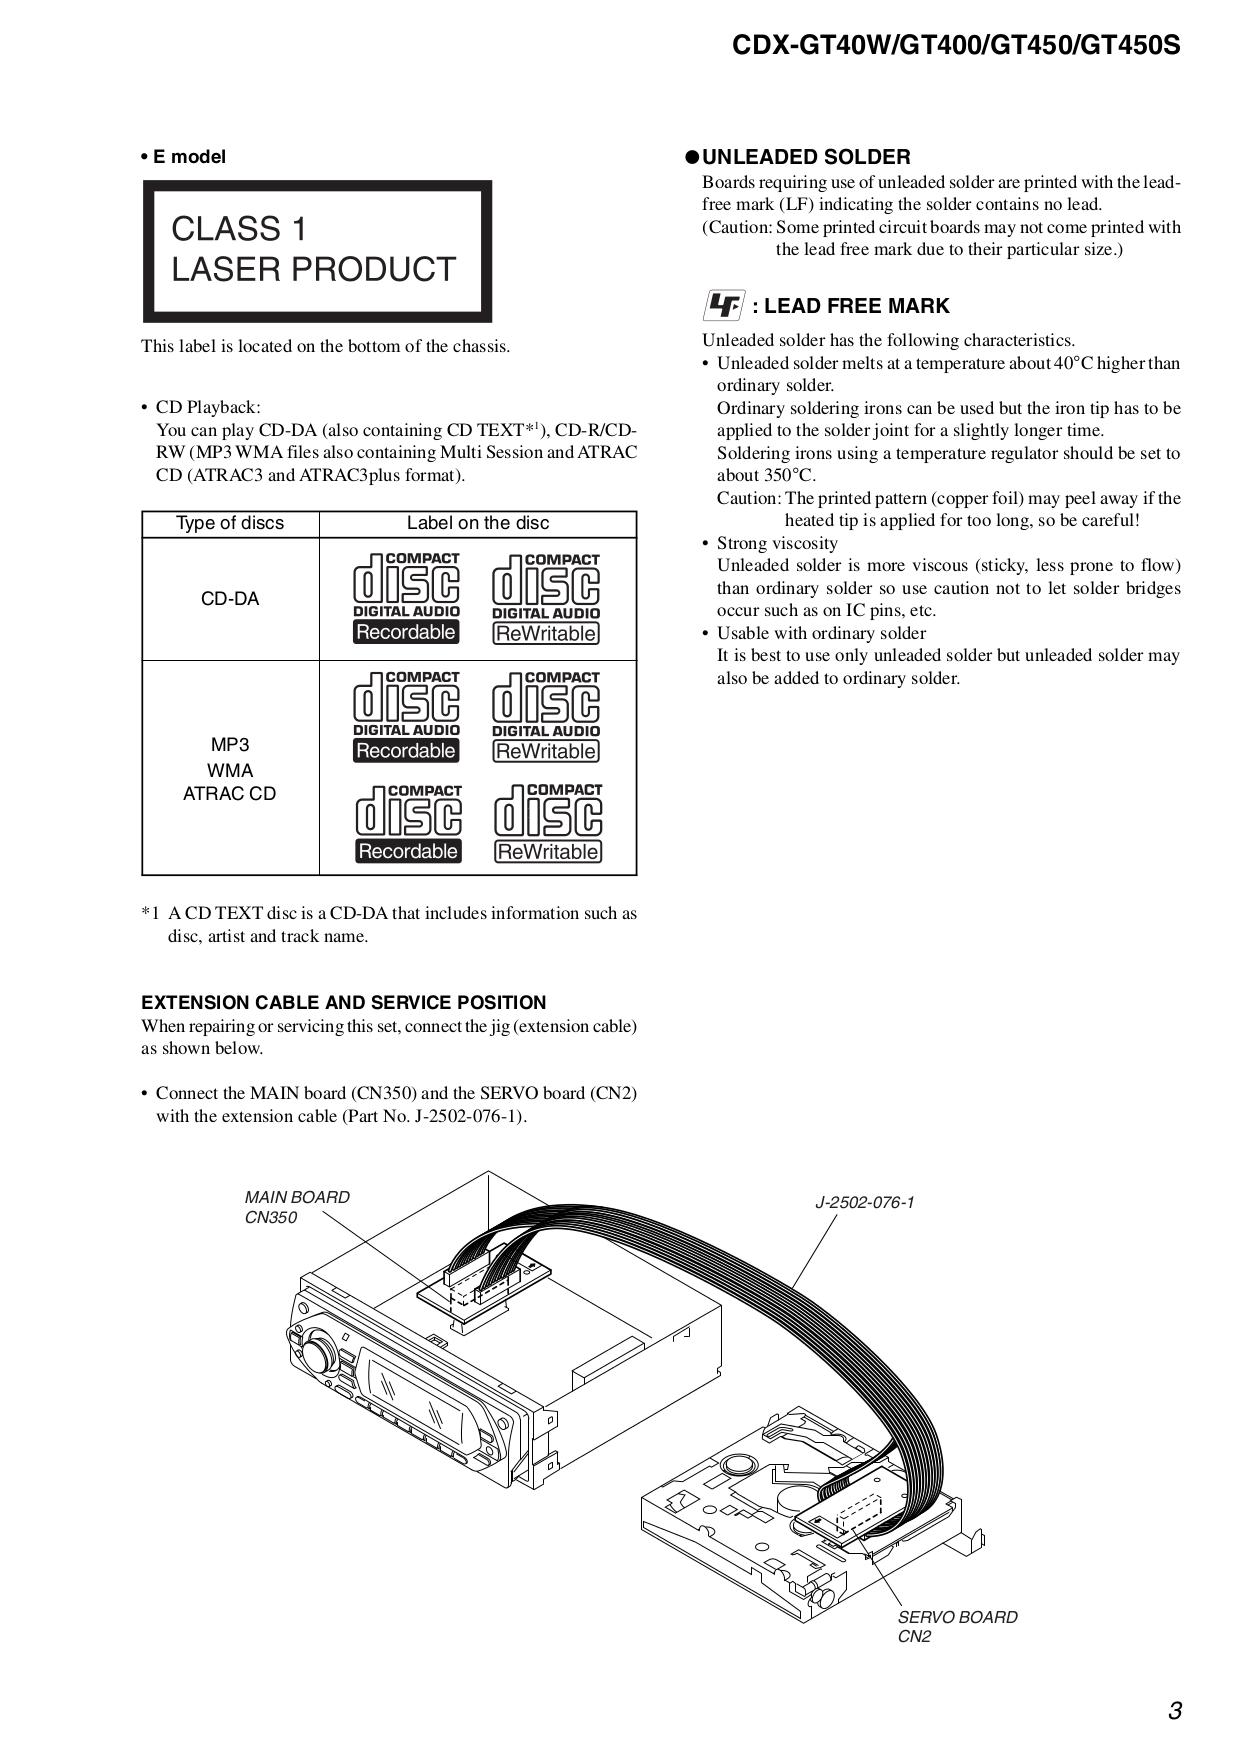 Sony Xplod Cdx-gt55uiw Wiring Diagram on